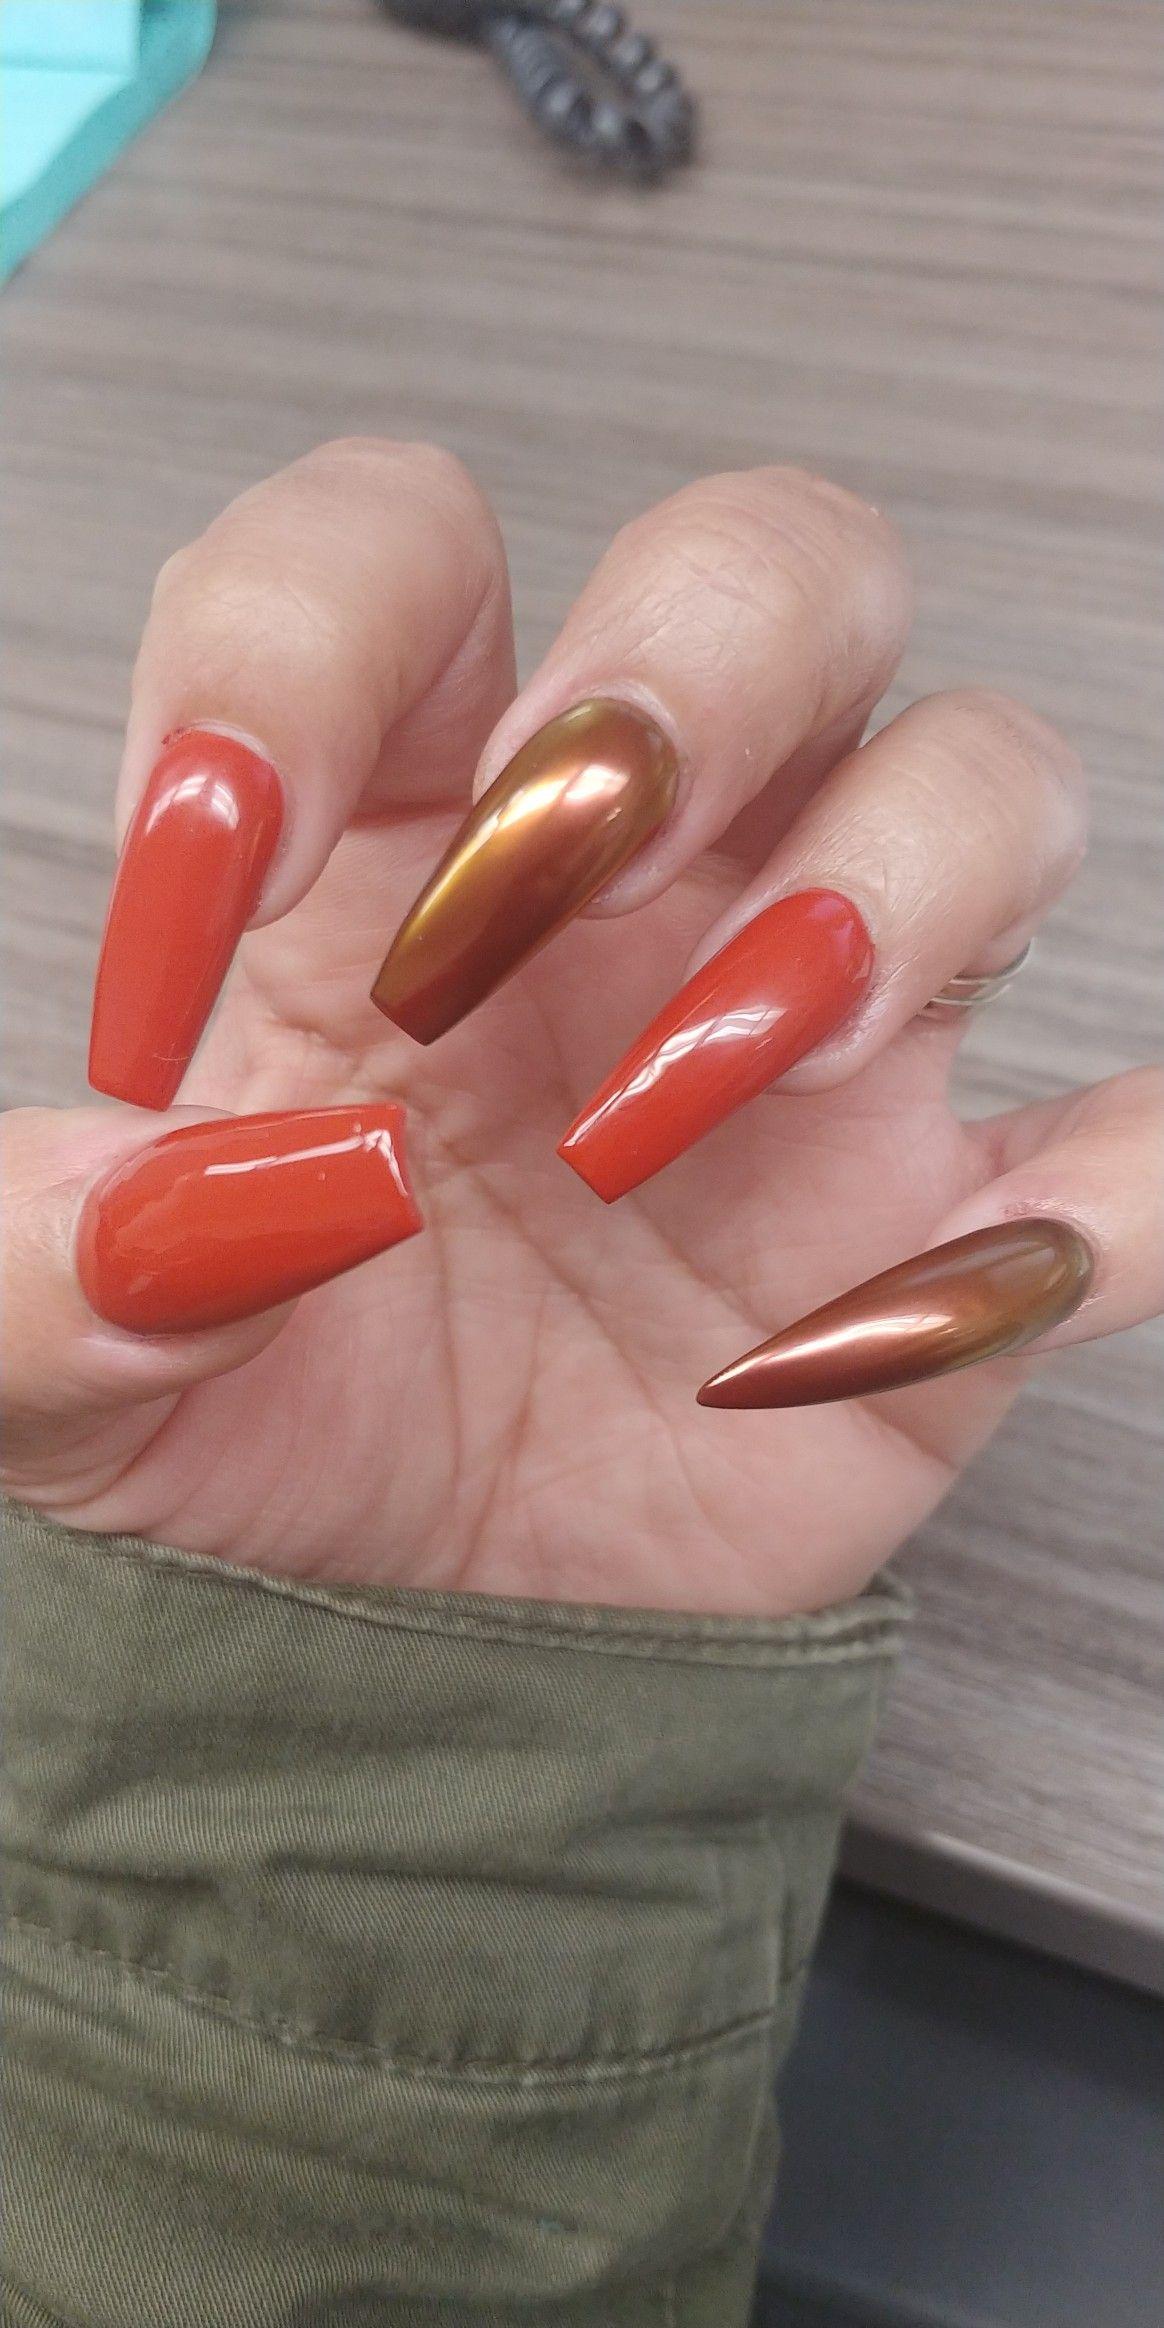 Burnt Orange 🍂 (With images) | Burnt orange, Nail art, Nails